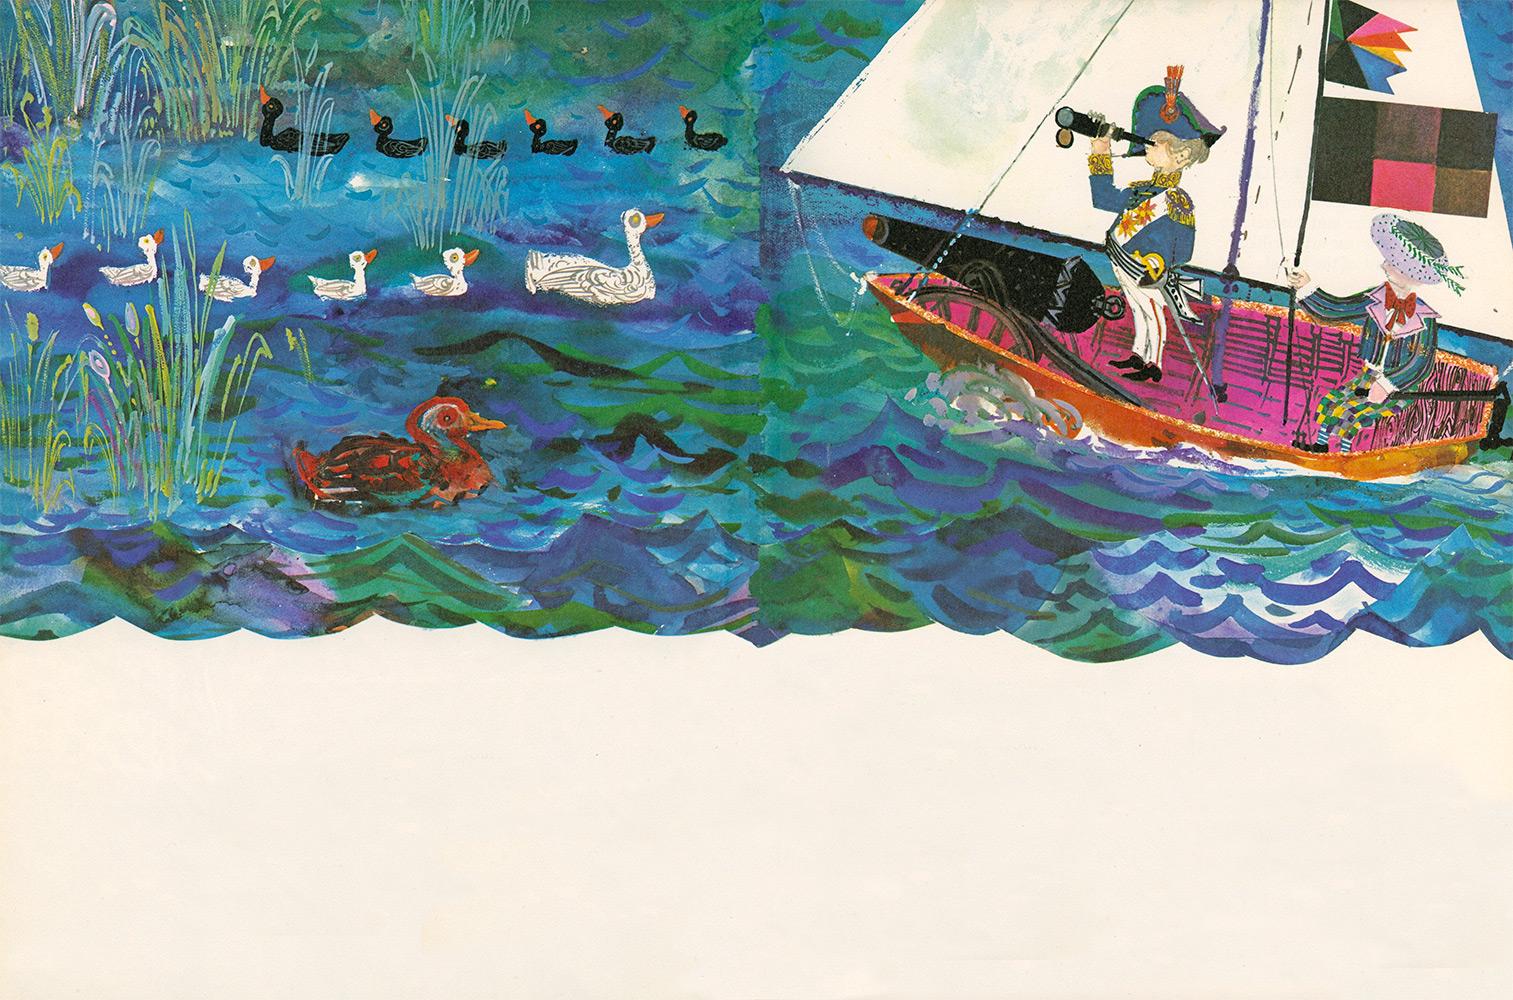 Robert-Louis-Stevenson-a-childs-garden-of-verses-My-Ship-and-I-Brian-Wildsmith.jpg